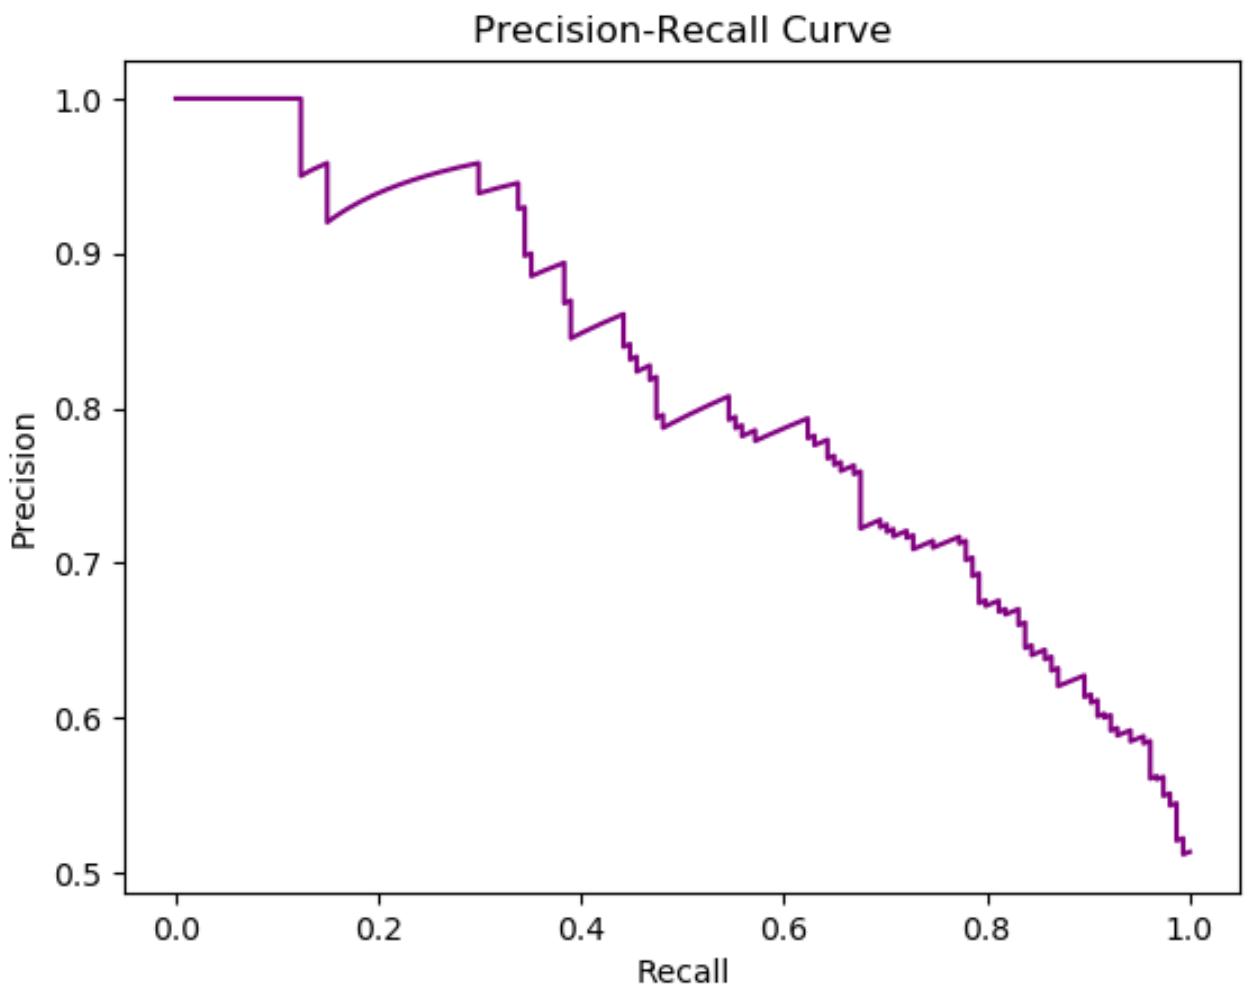 Precision-recall curve in Python